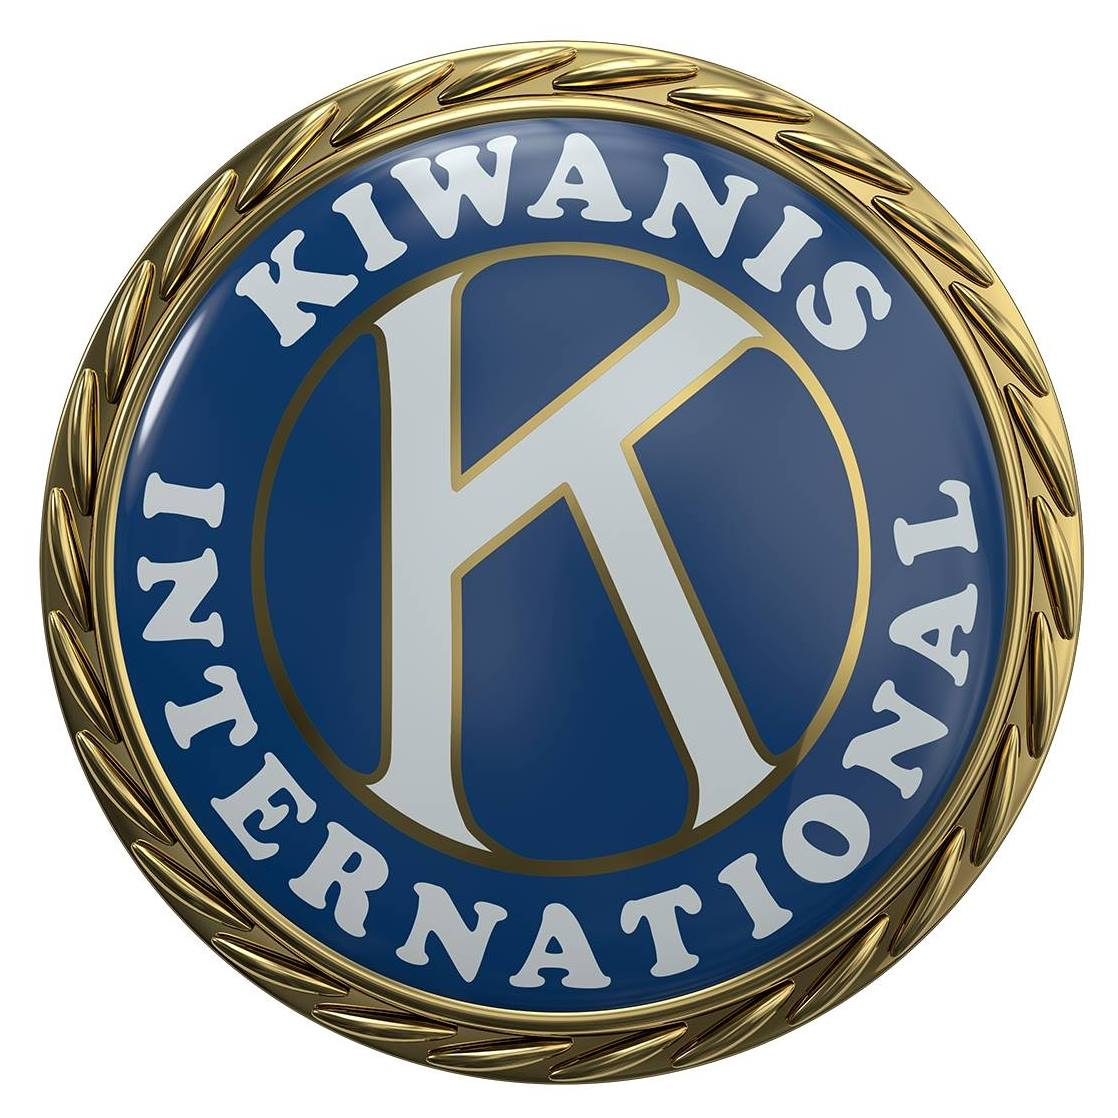 Adrian Kiwanis